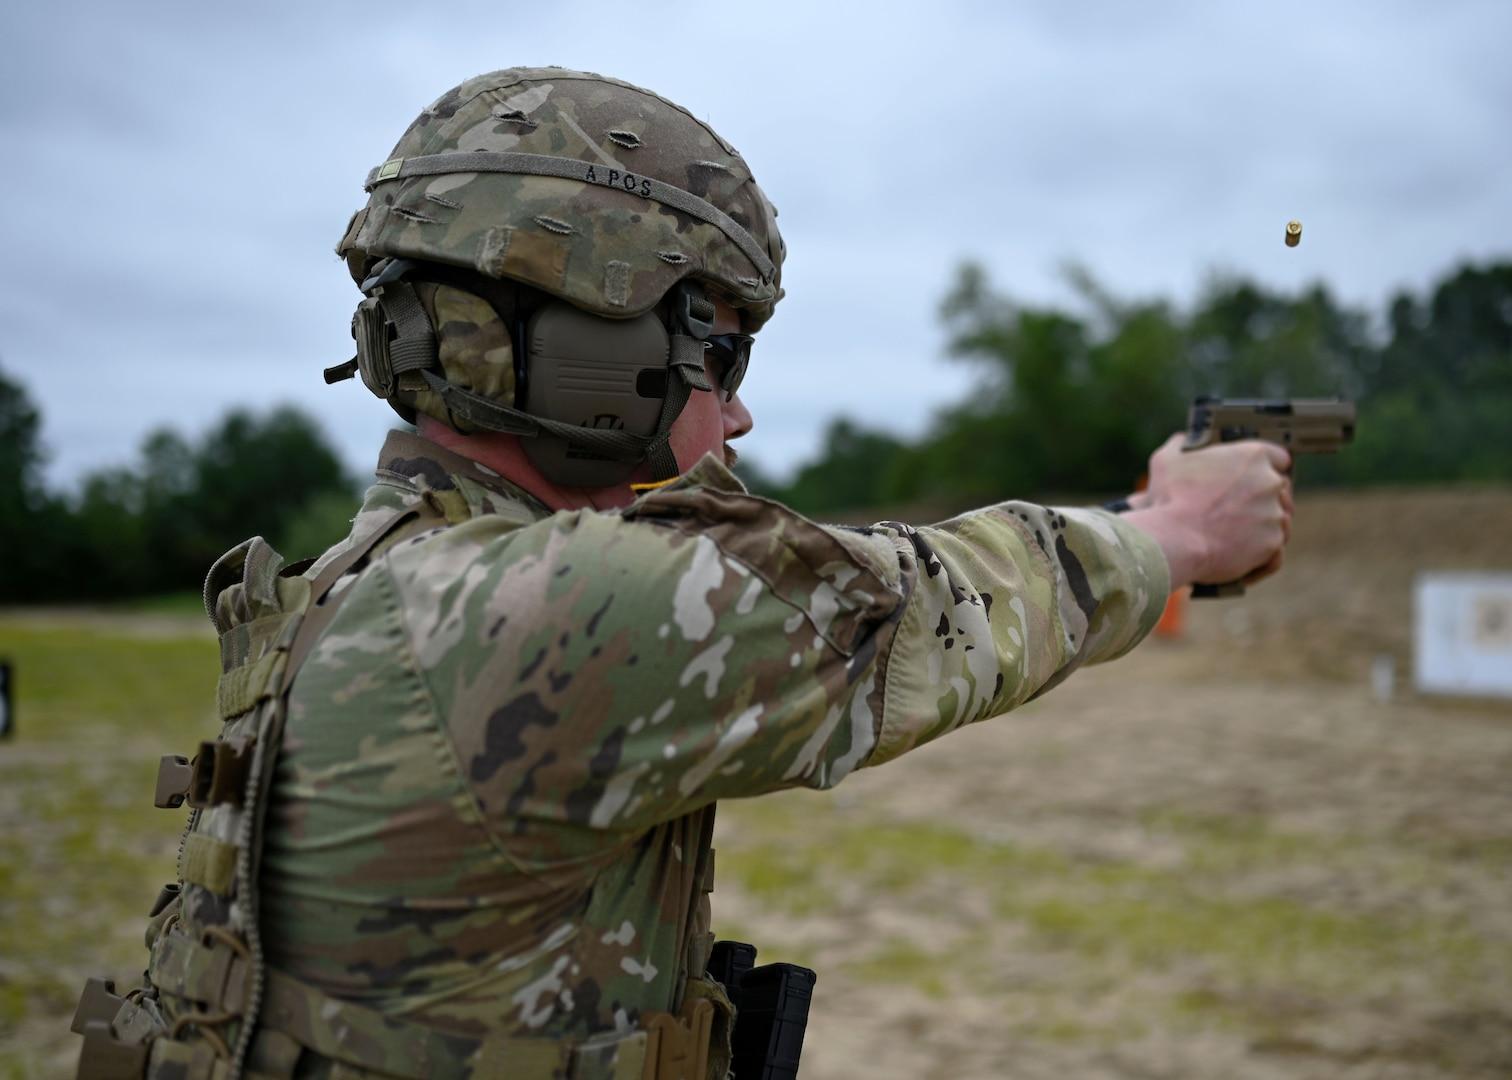 Staff Sgt. Dean Van Tassel of A Battery, 3-197th Field Artillery Brigade, fires an M17 pistol during the NHNG annual combat marksmanship competition July 8, 2021,a t Fort Devens, Mass.